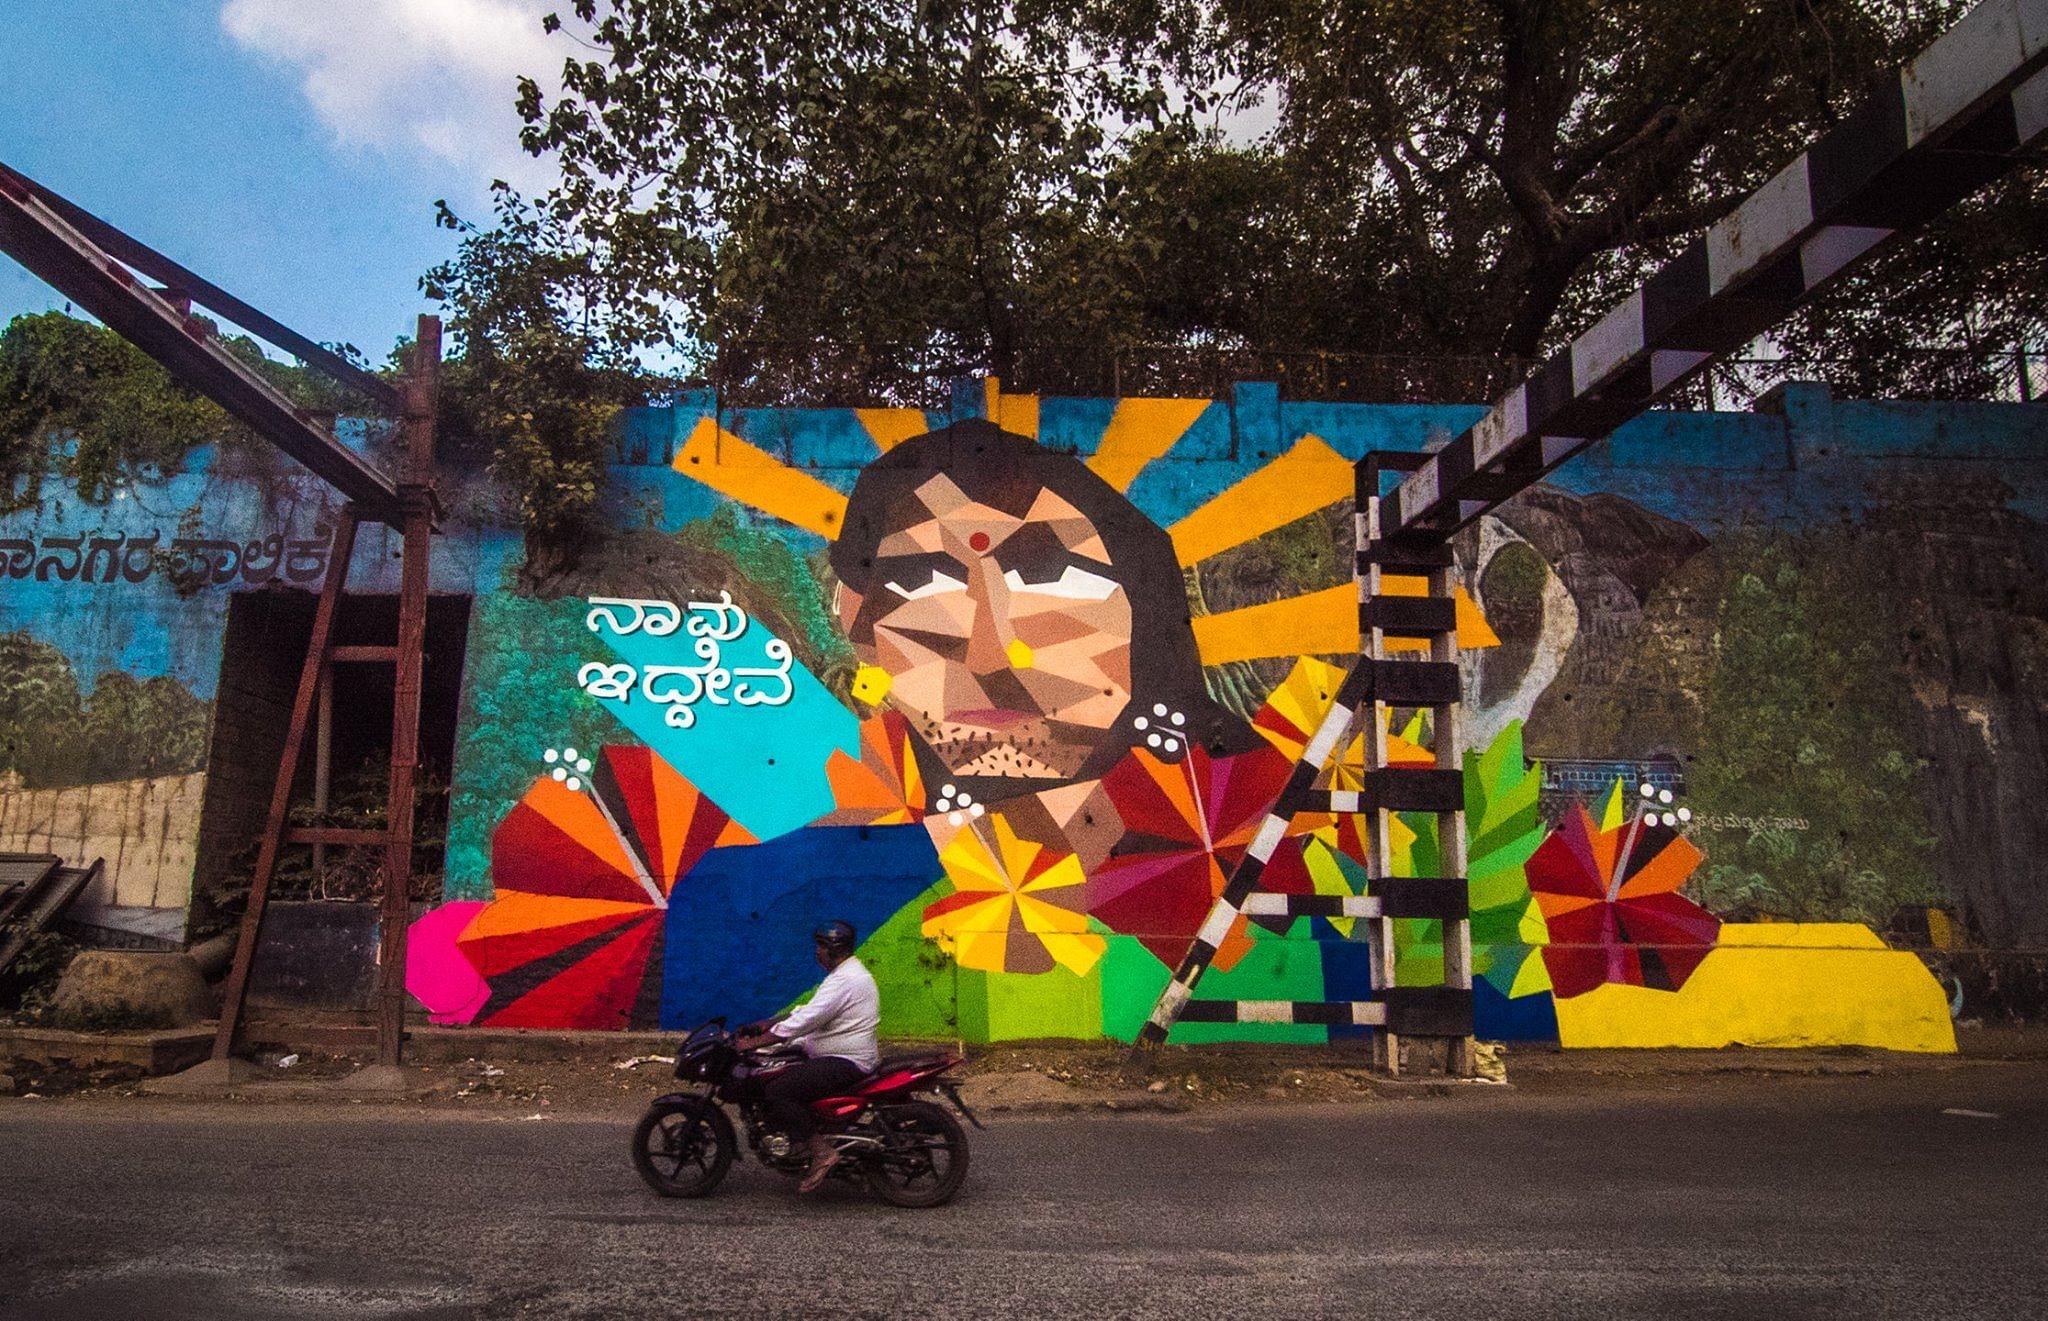 Chennai – The Better India